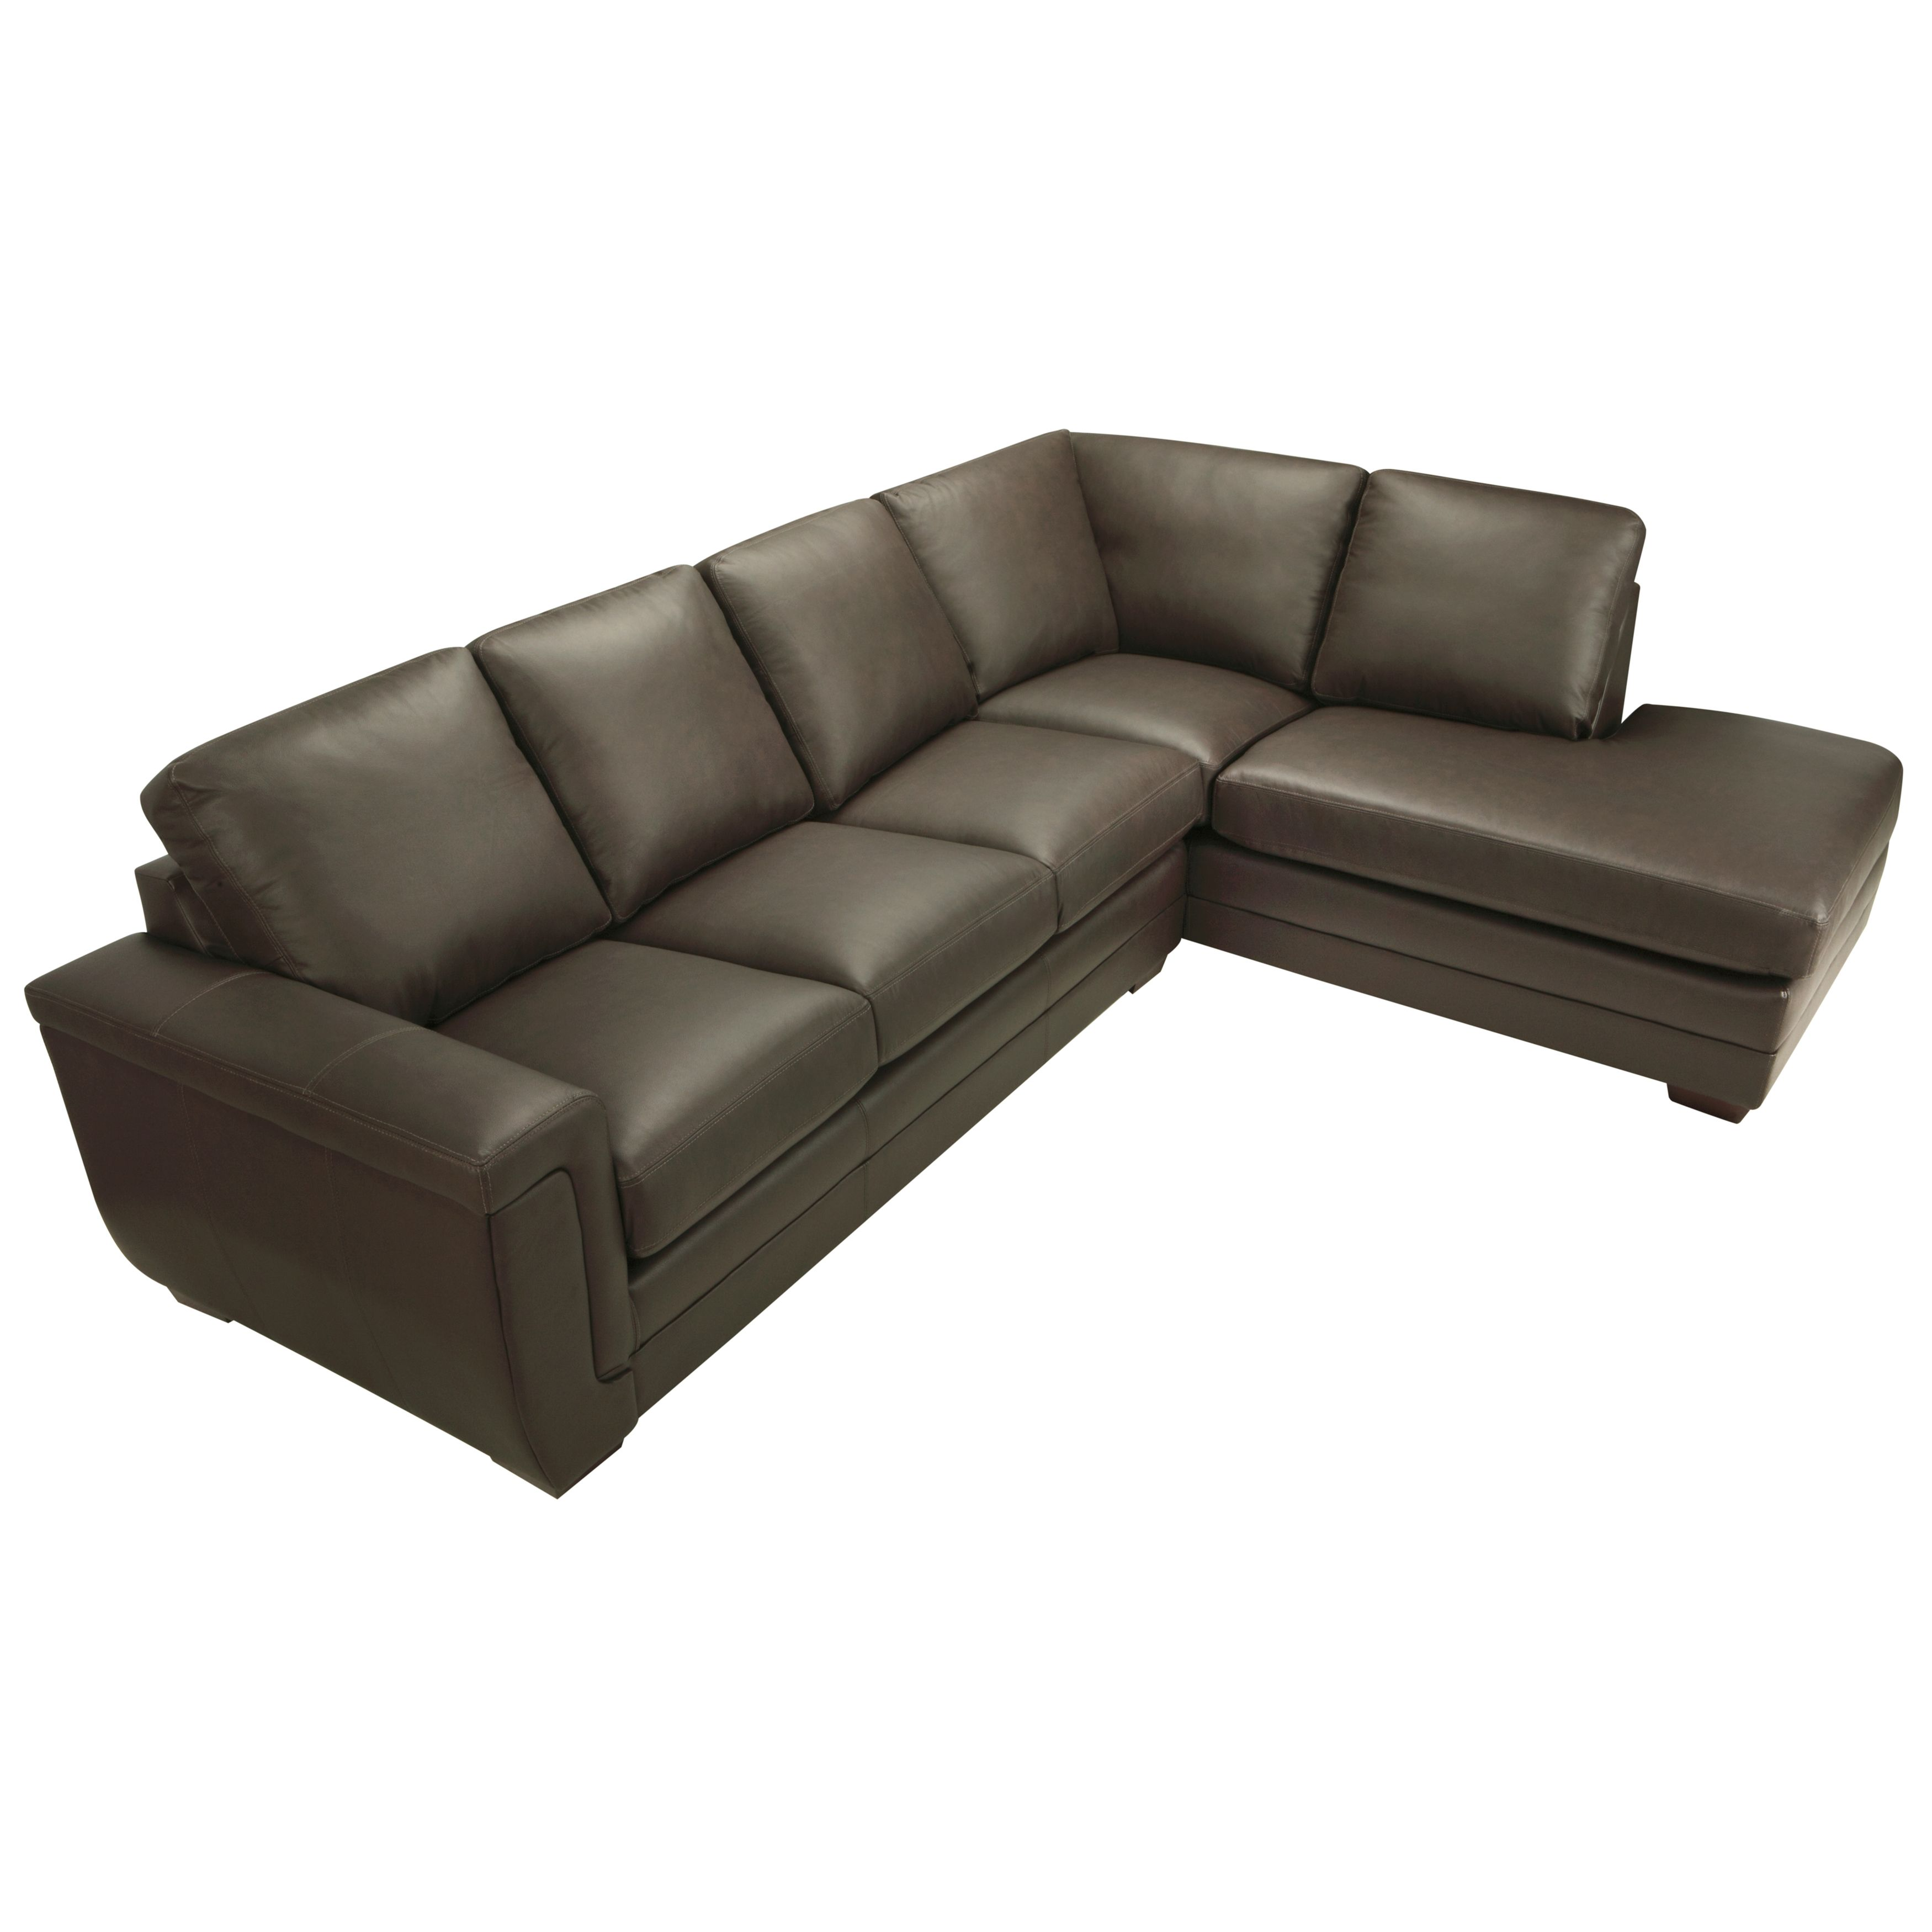 3 2 leather sofa deals corner sofas dfs porsche chocolate brown italian sectional